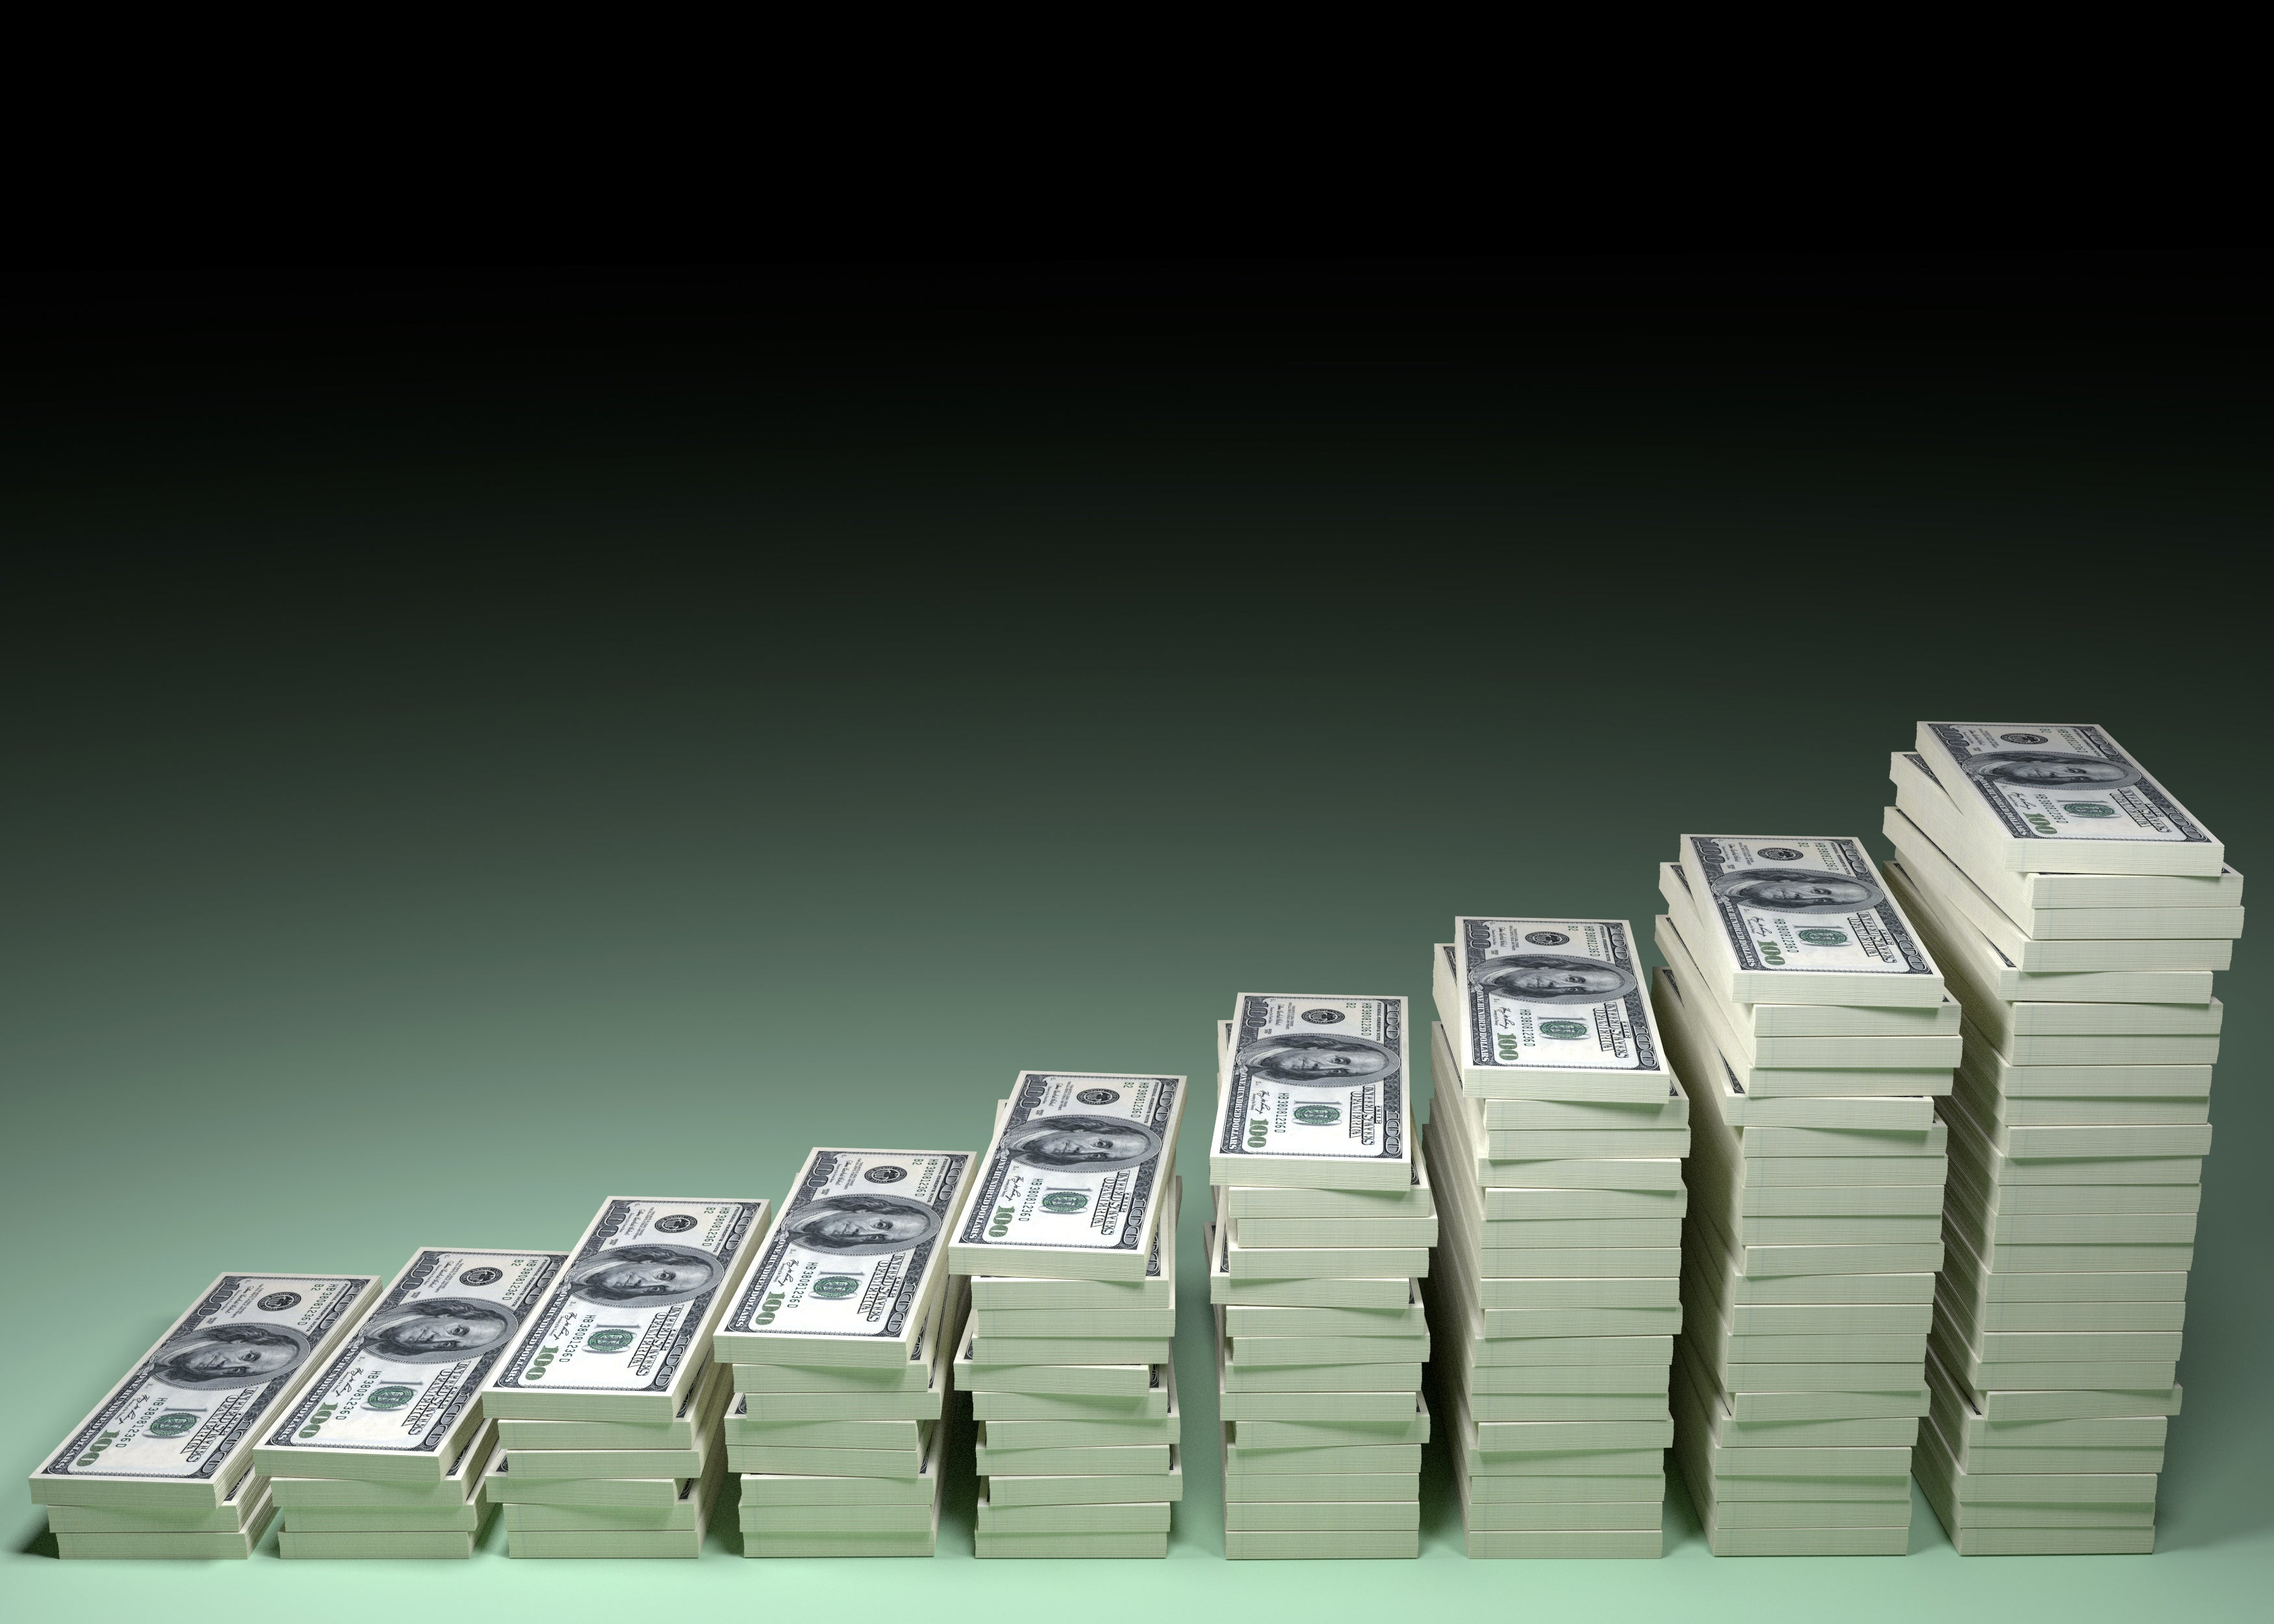 Novocure Nvcr Stock Price News The Motley Fool